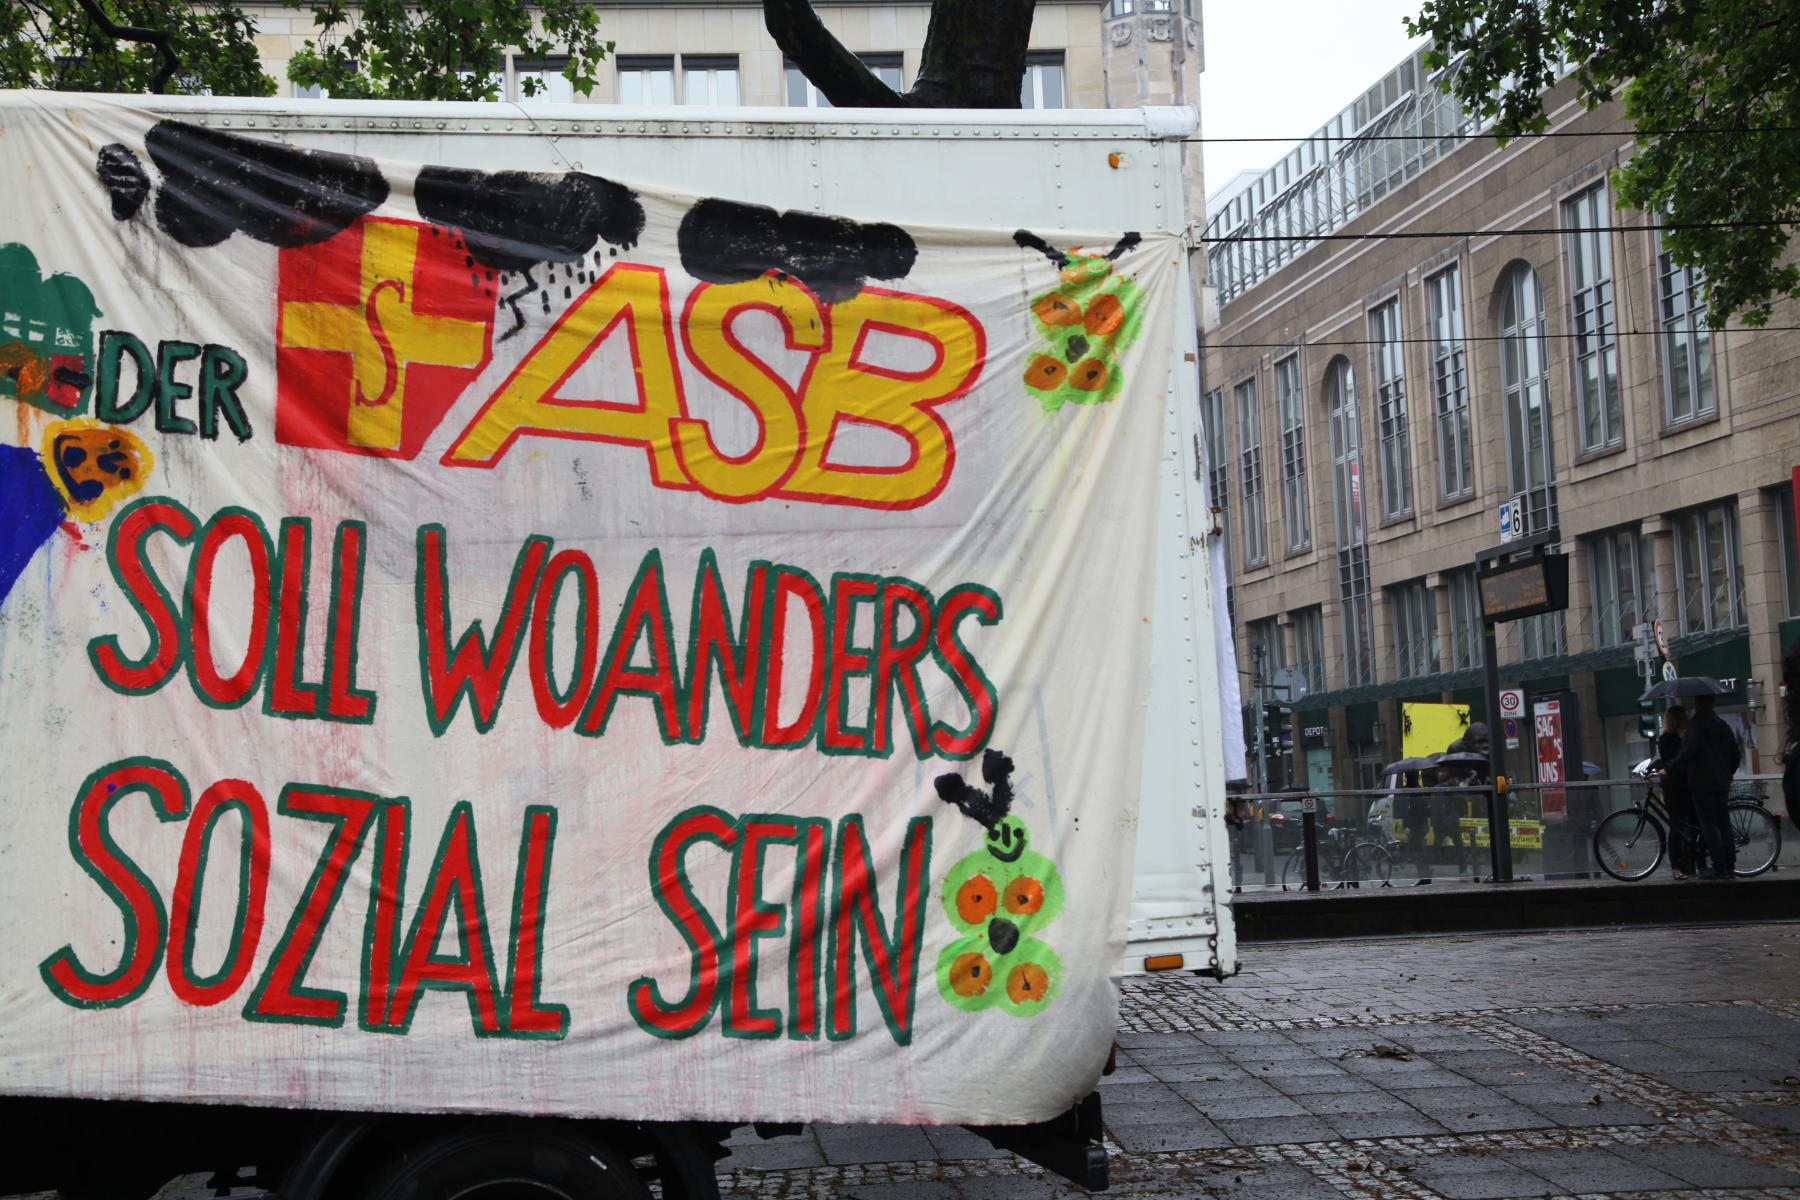 ASB bauwagenplatz wemgehoertdiewelt demo